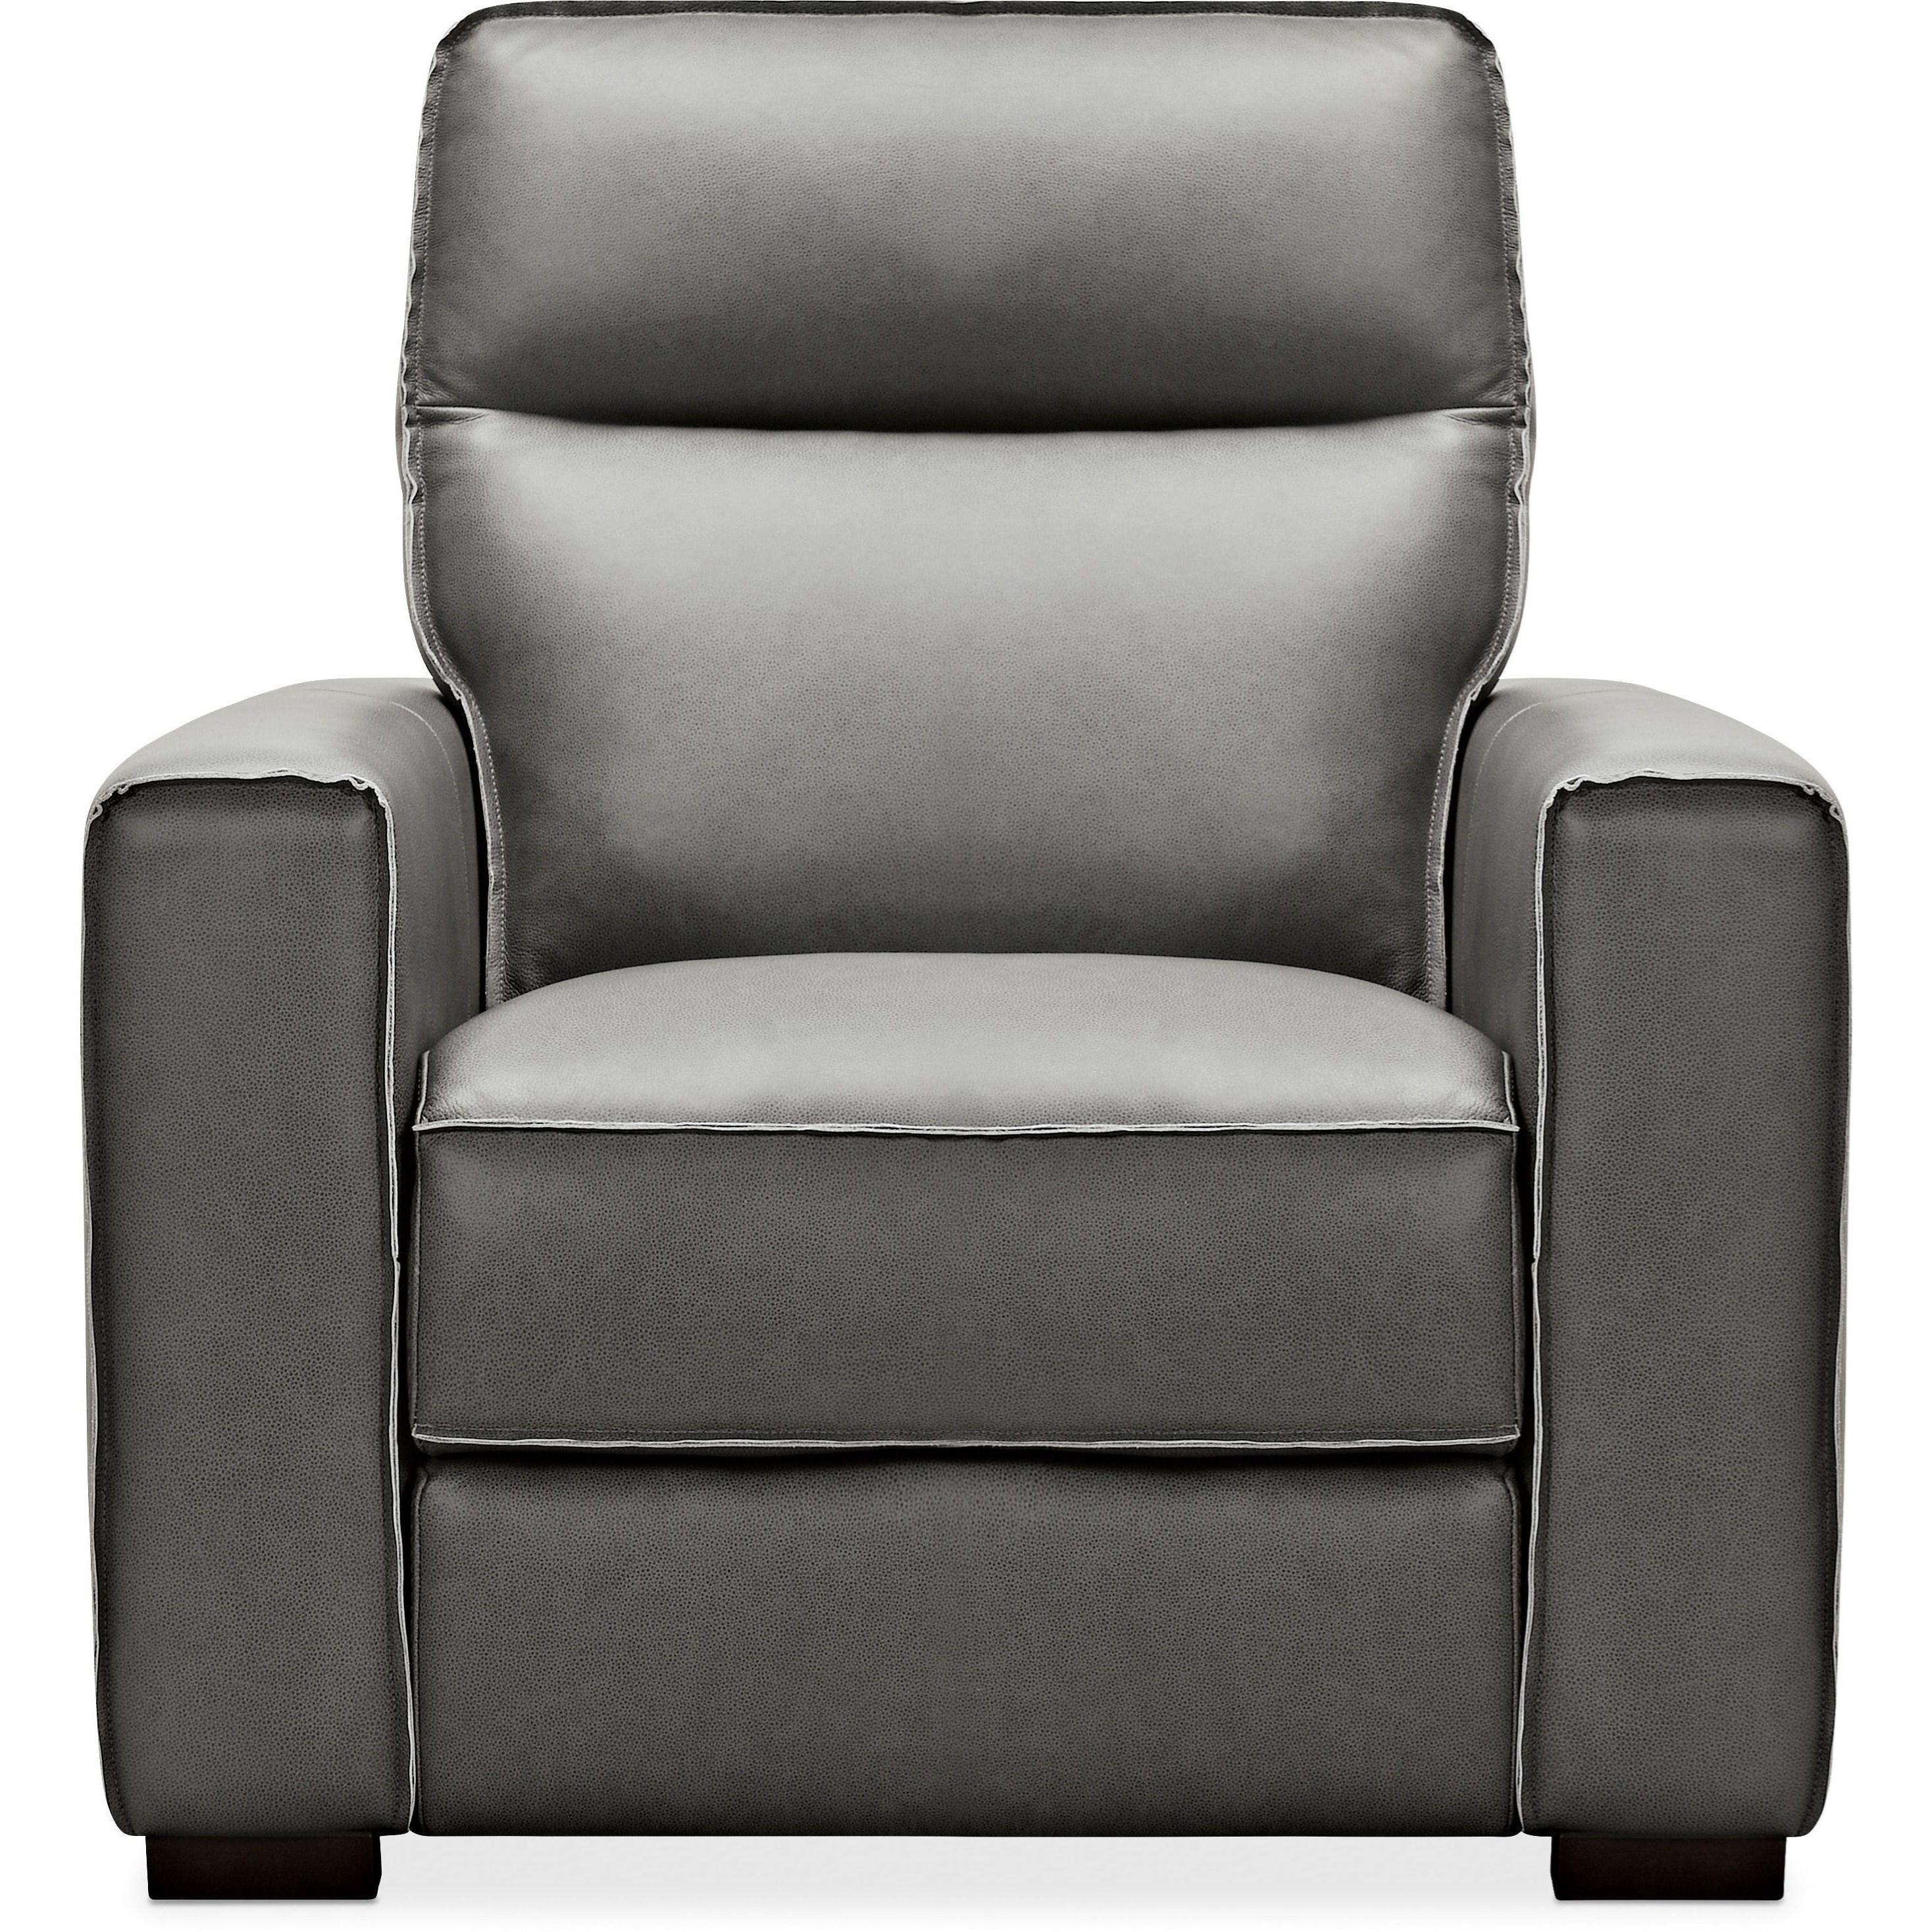 Braeburn Leather Recliner w/ Power Headrest by Hooker Furniture at Baer's Furniture